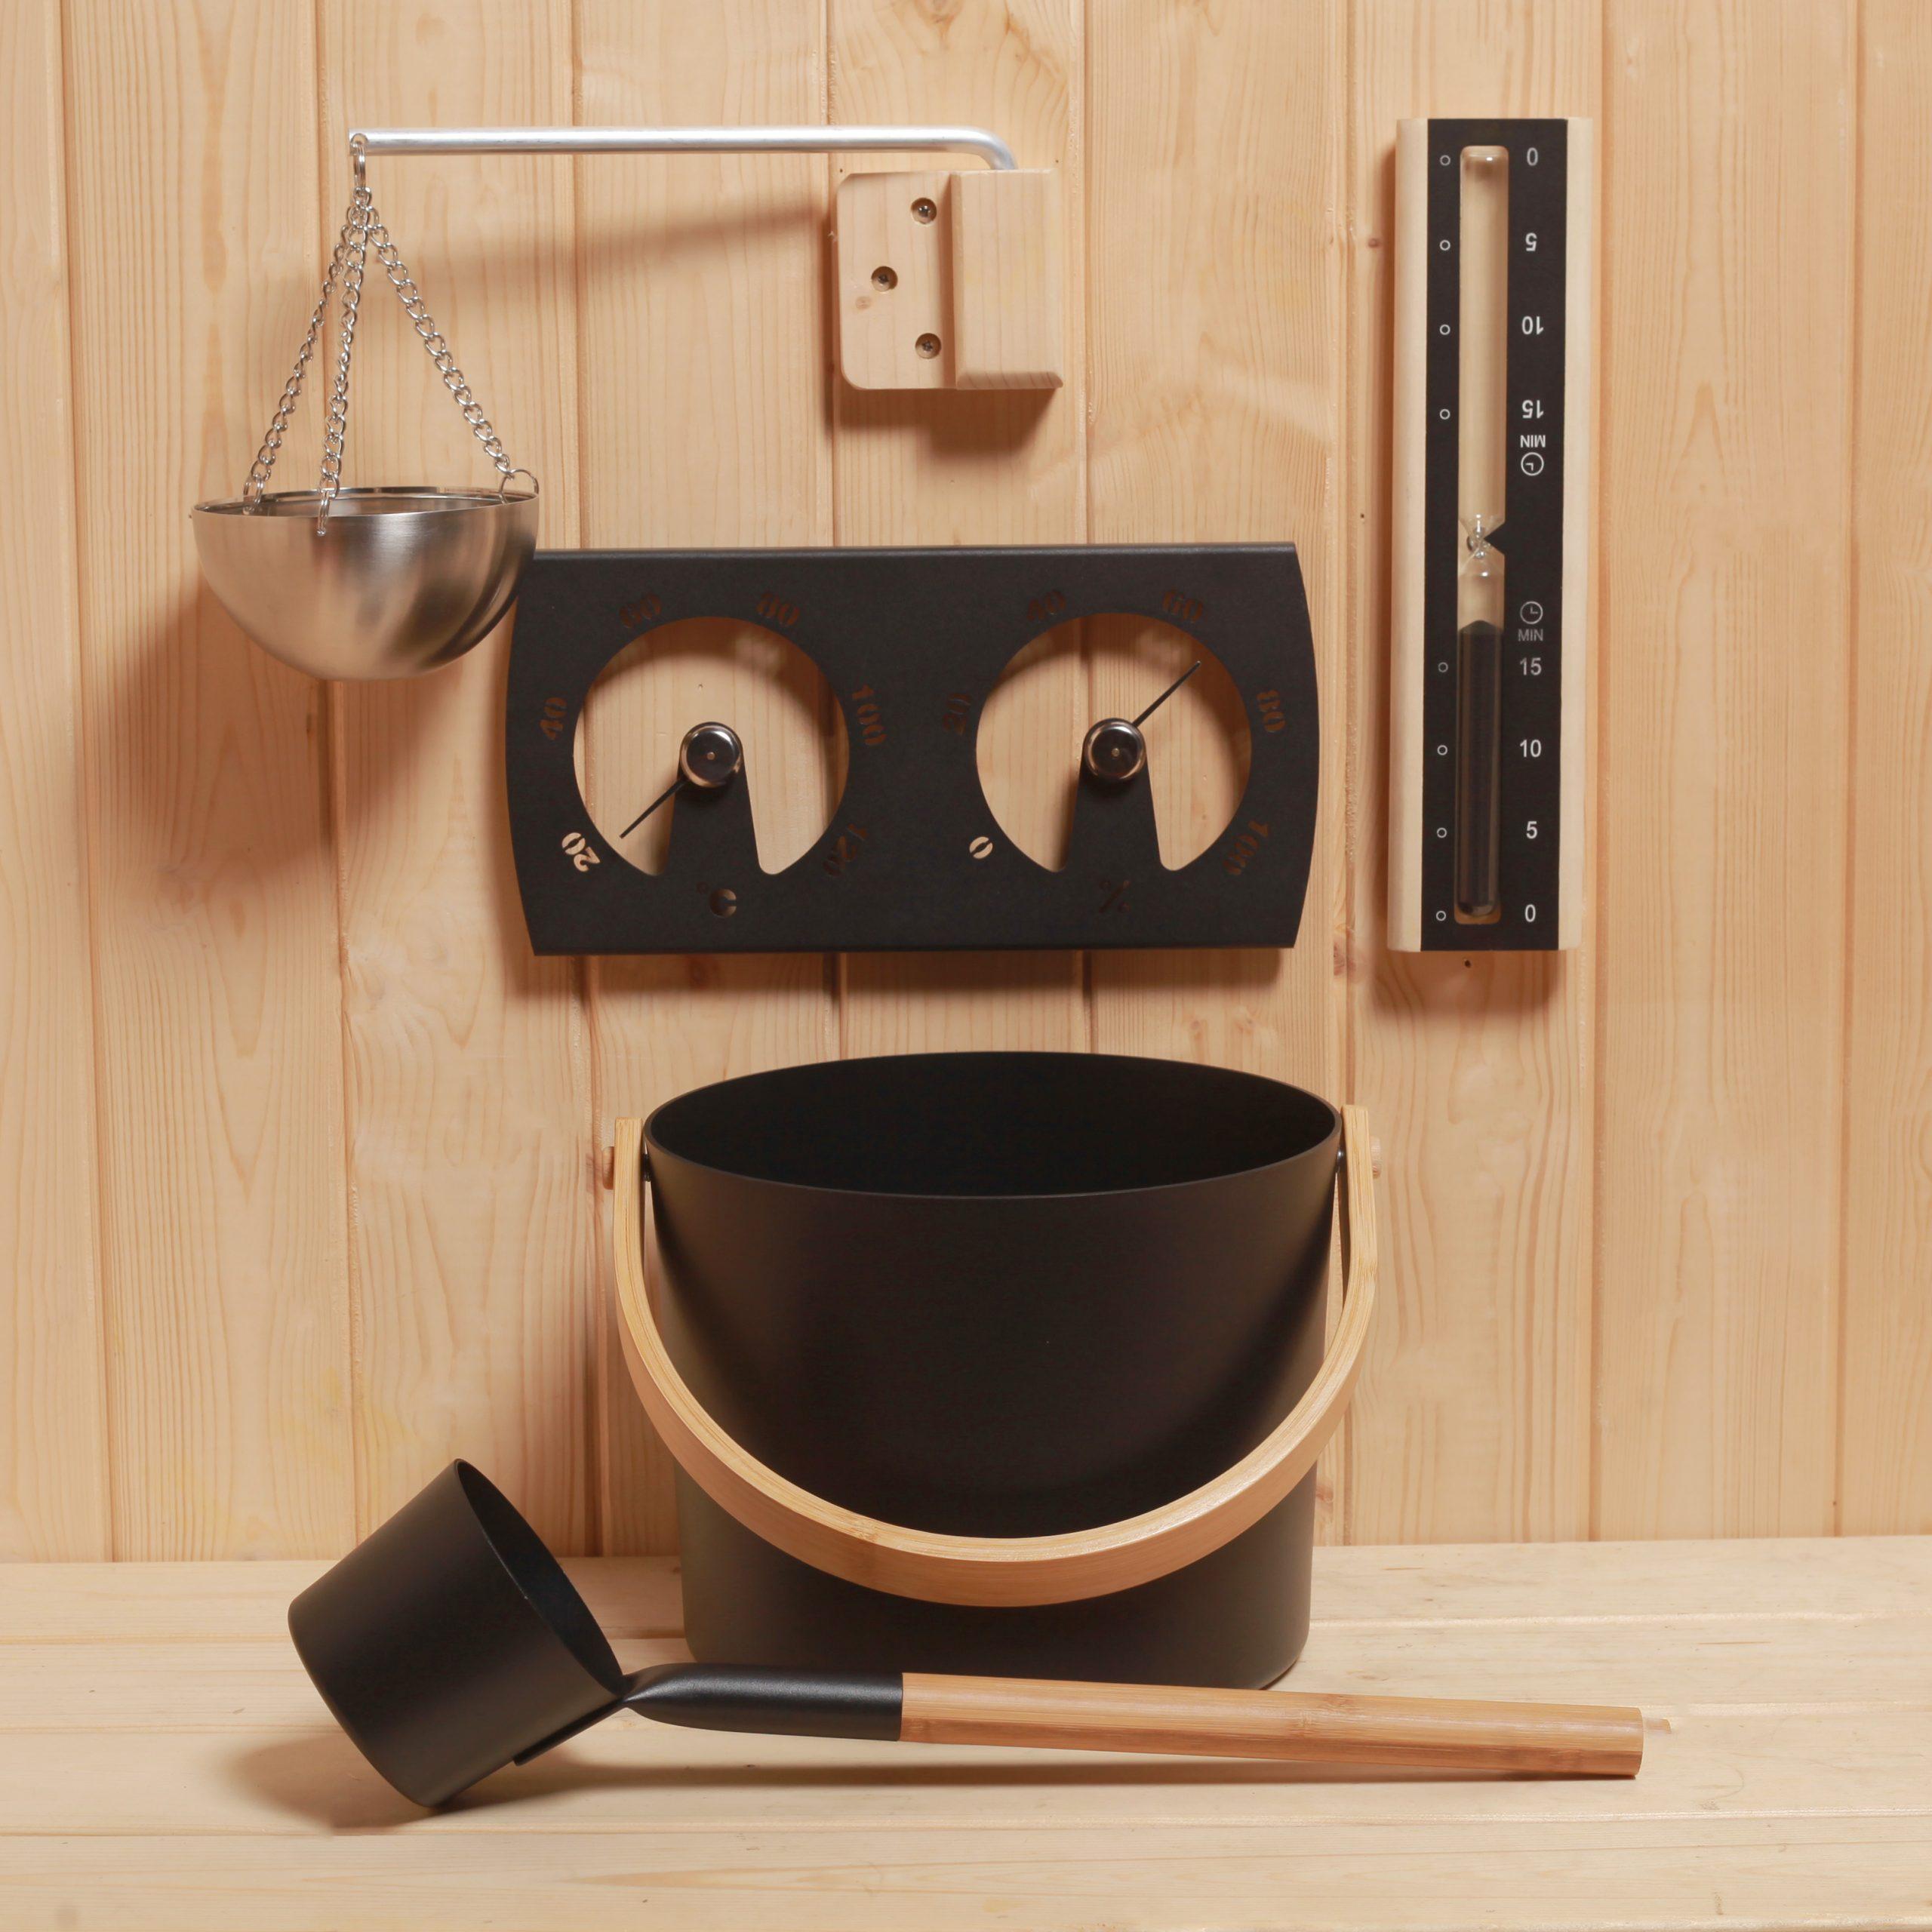 sauna accessories set W-ST063